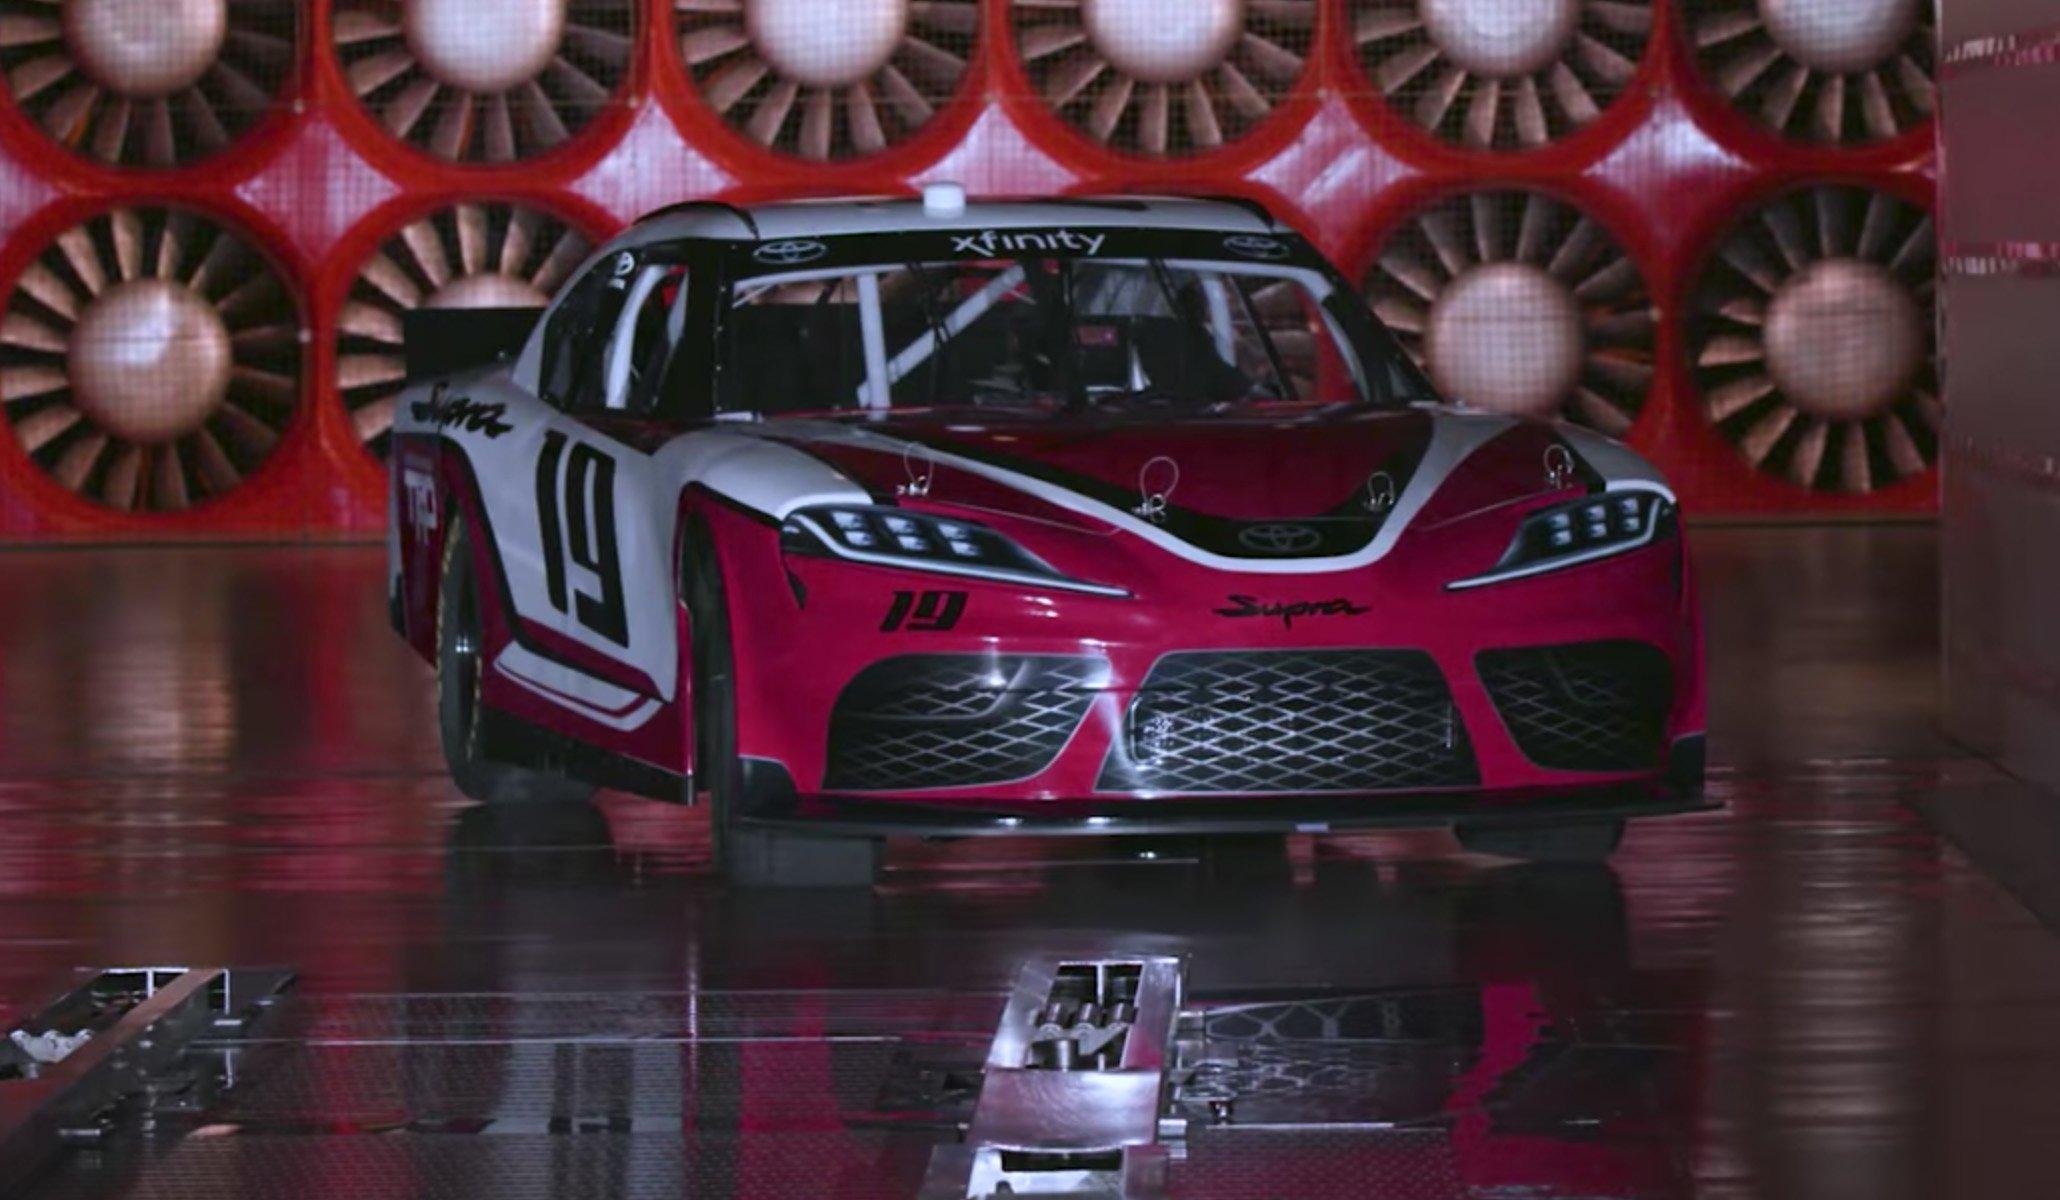 2019 Toyota Supra - NASCAR Racecar